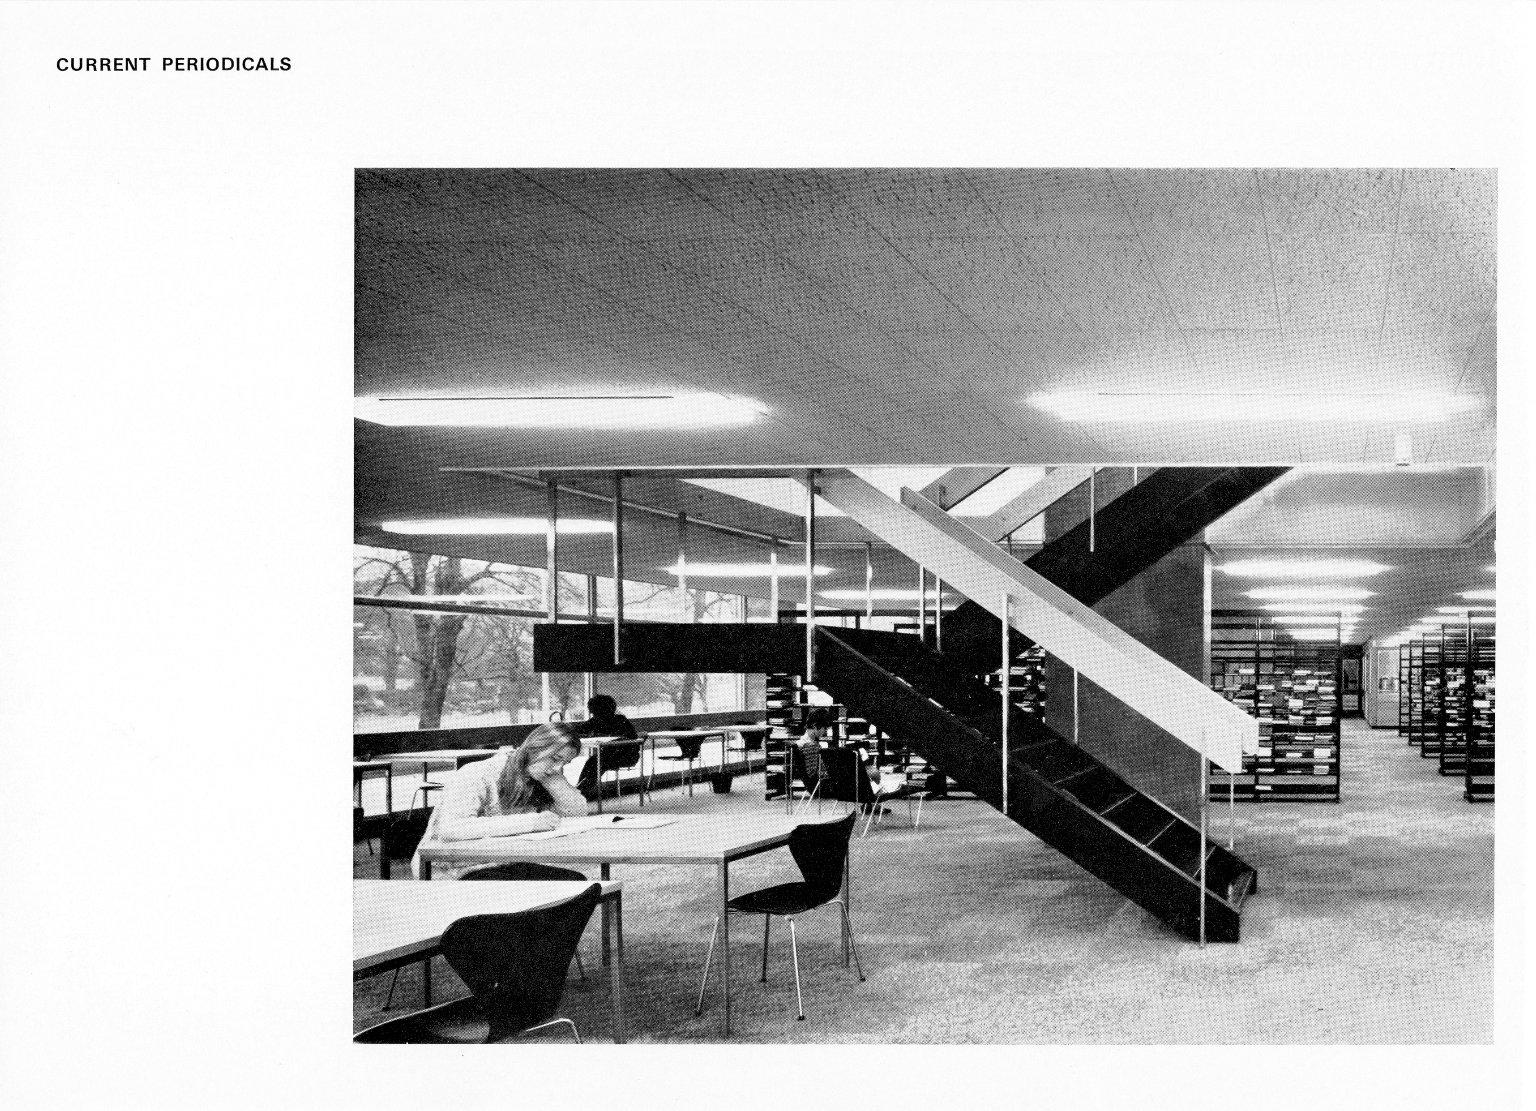 9. Main Library